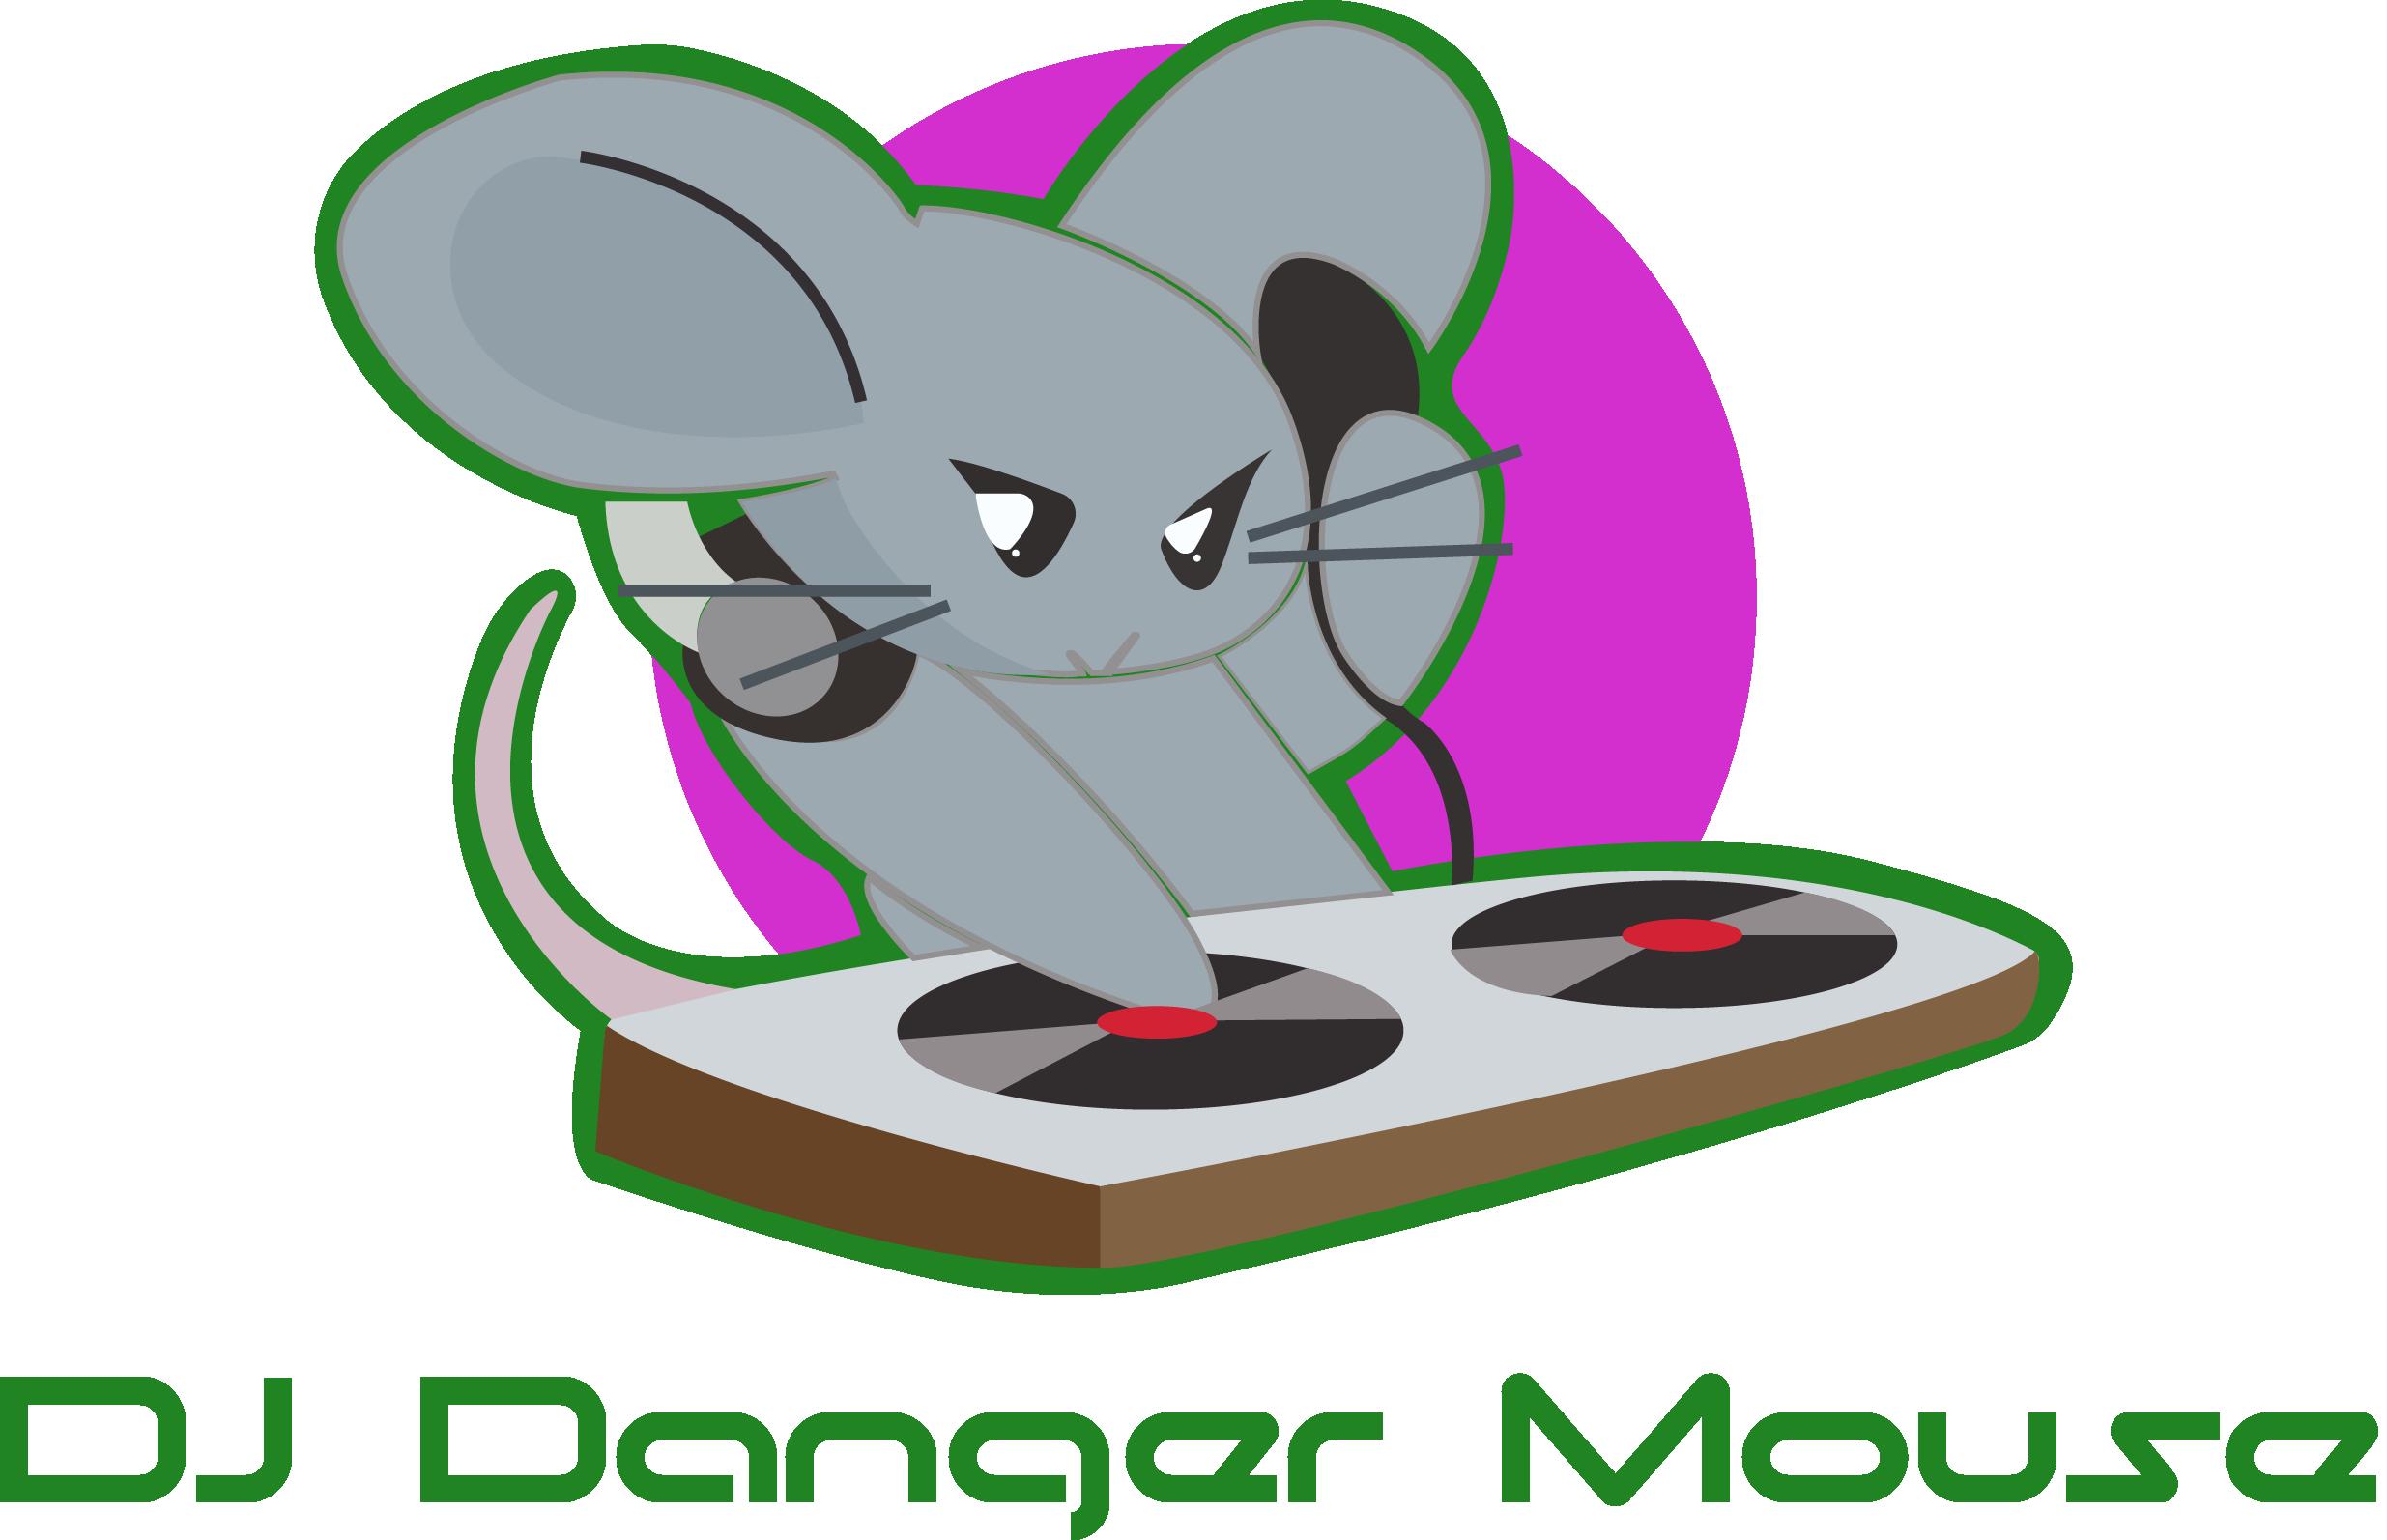 Beats clipart dj mixer Headphones DJ Danger Danger Guide